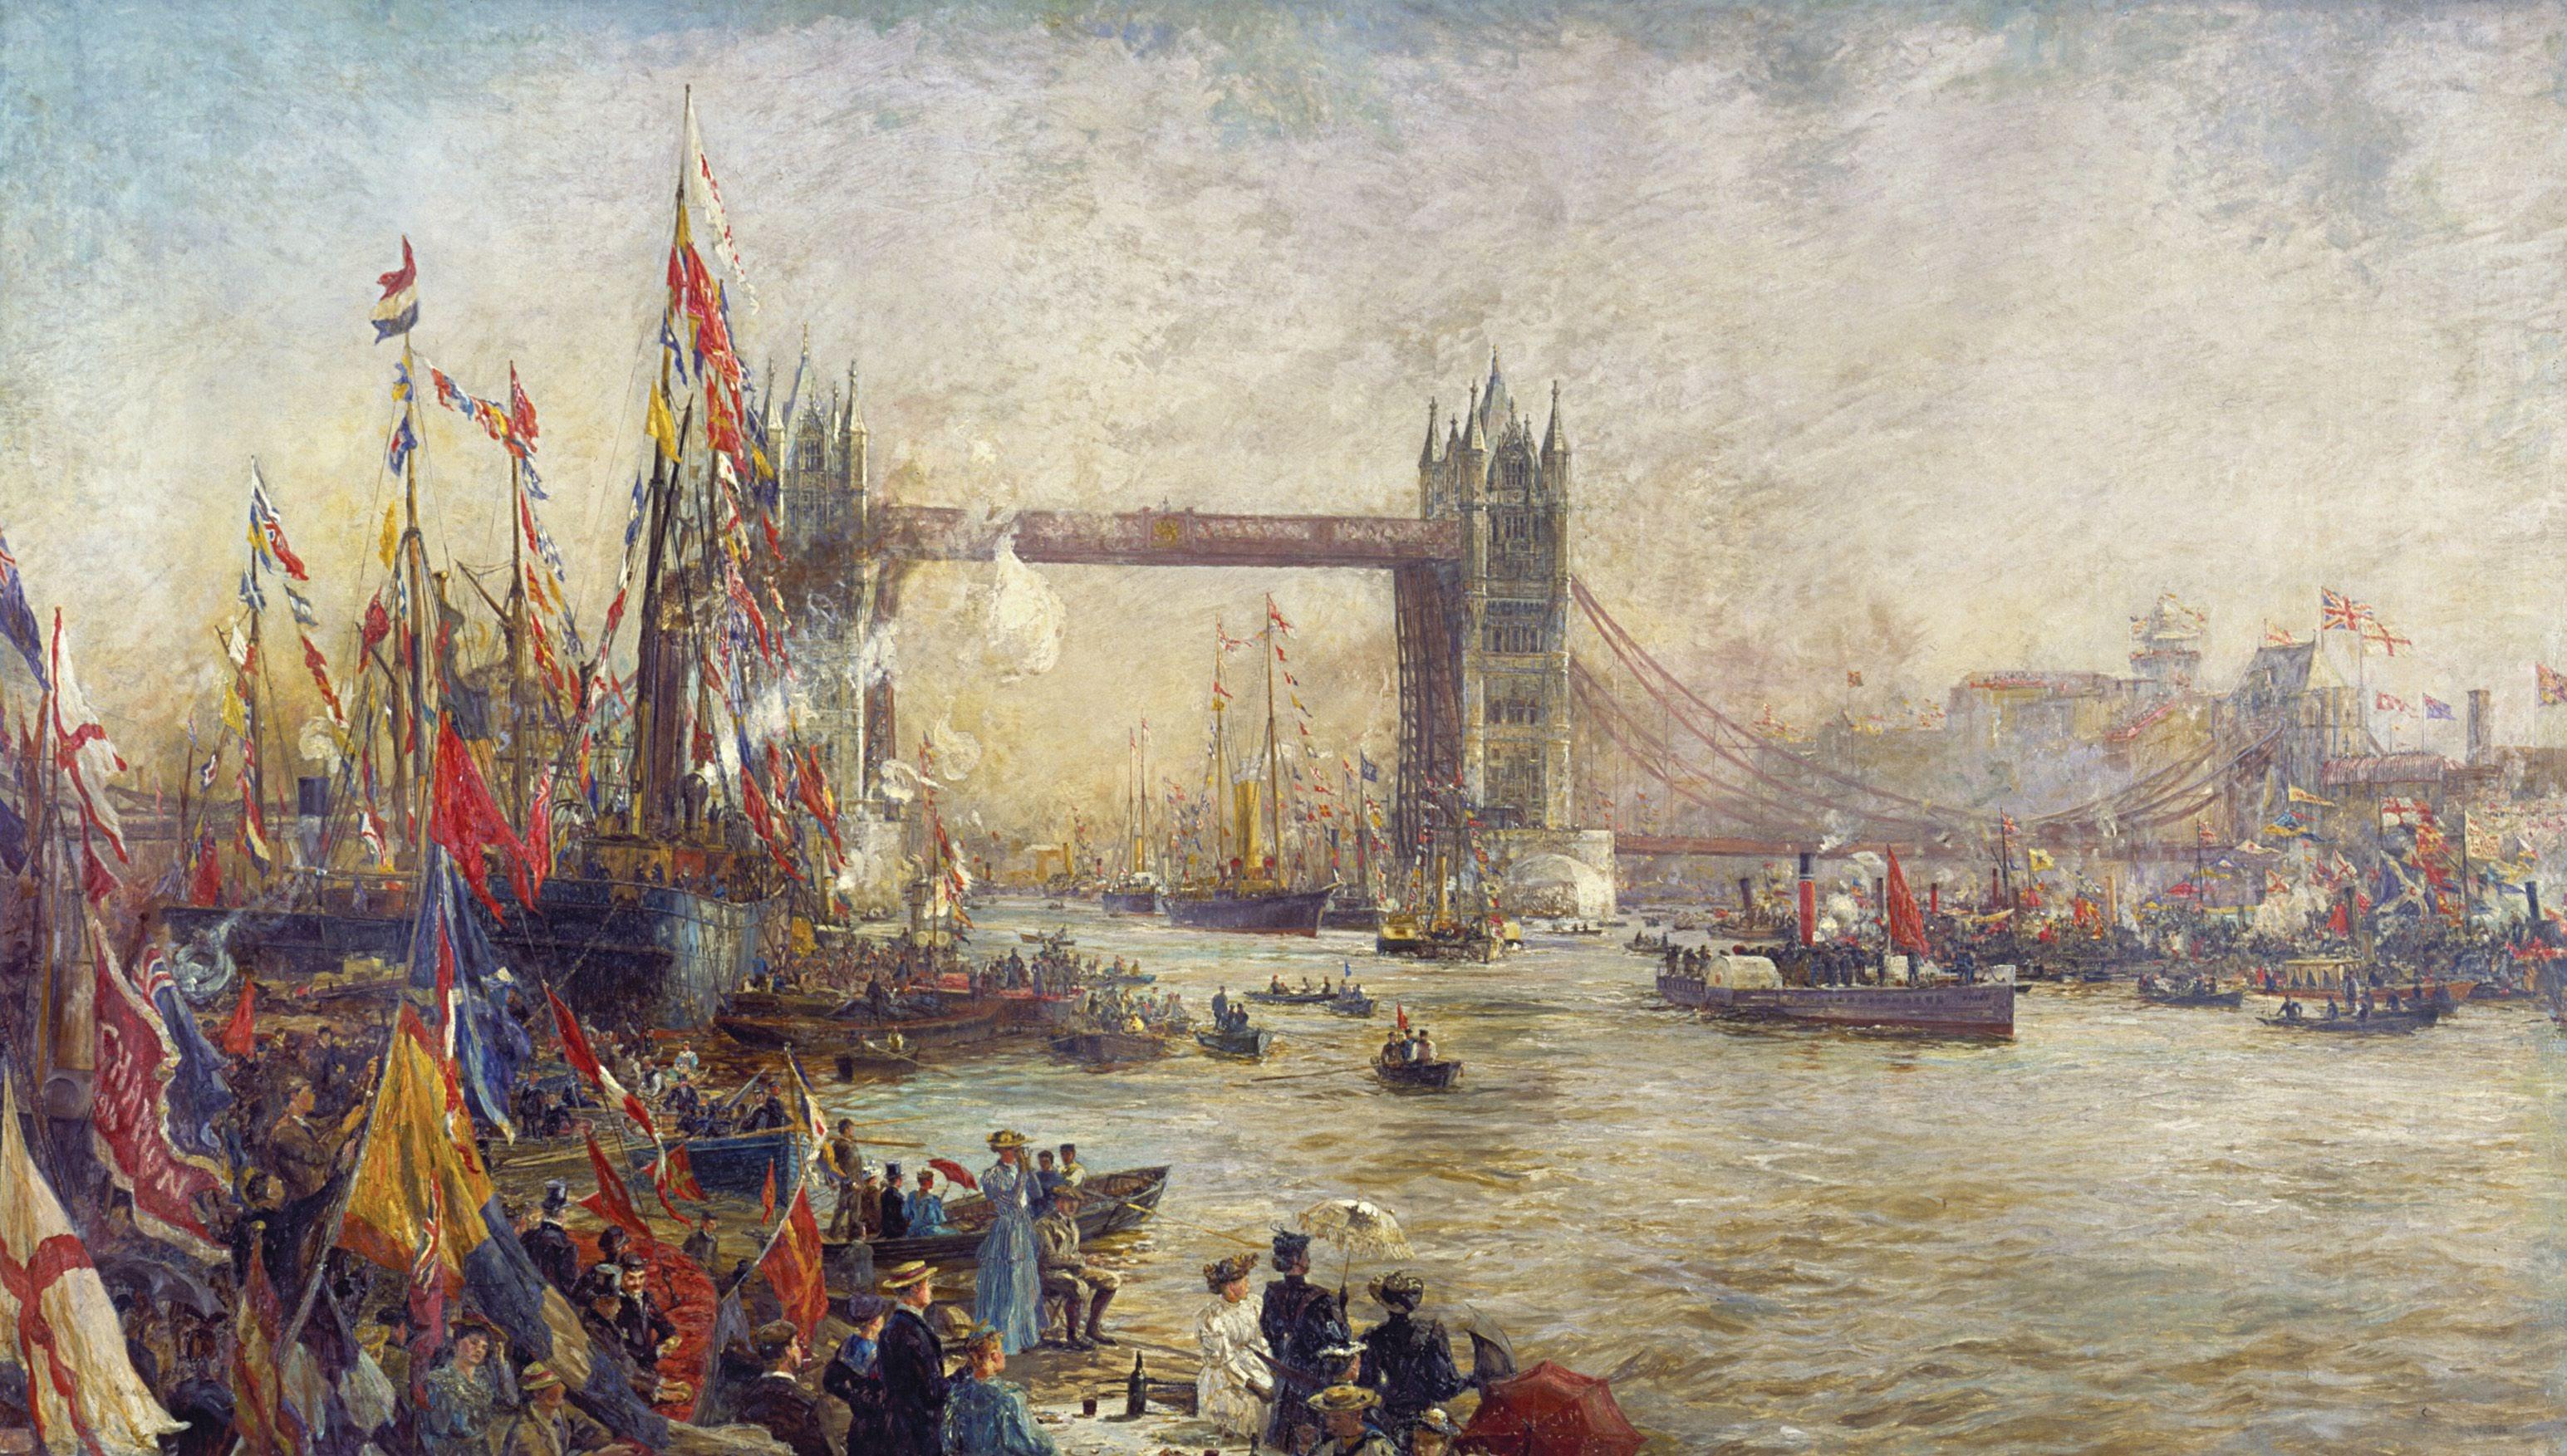 Charles William Wyllie Opening of Tower Bridge